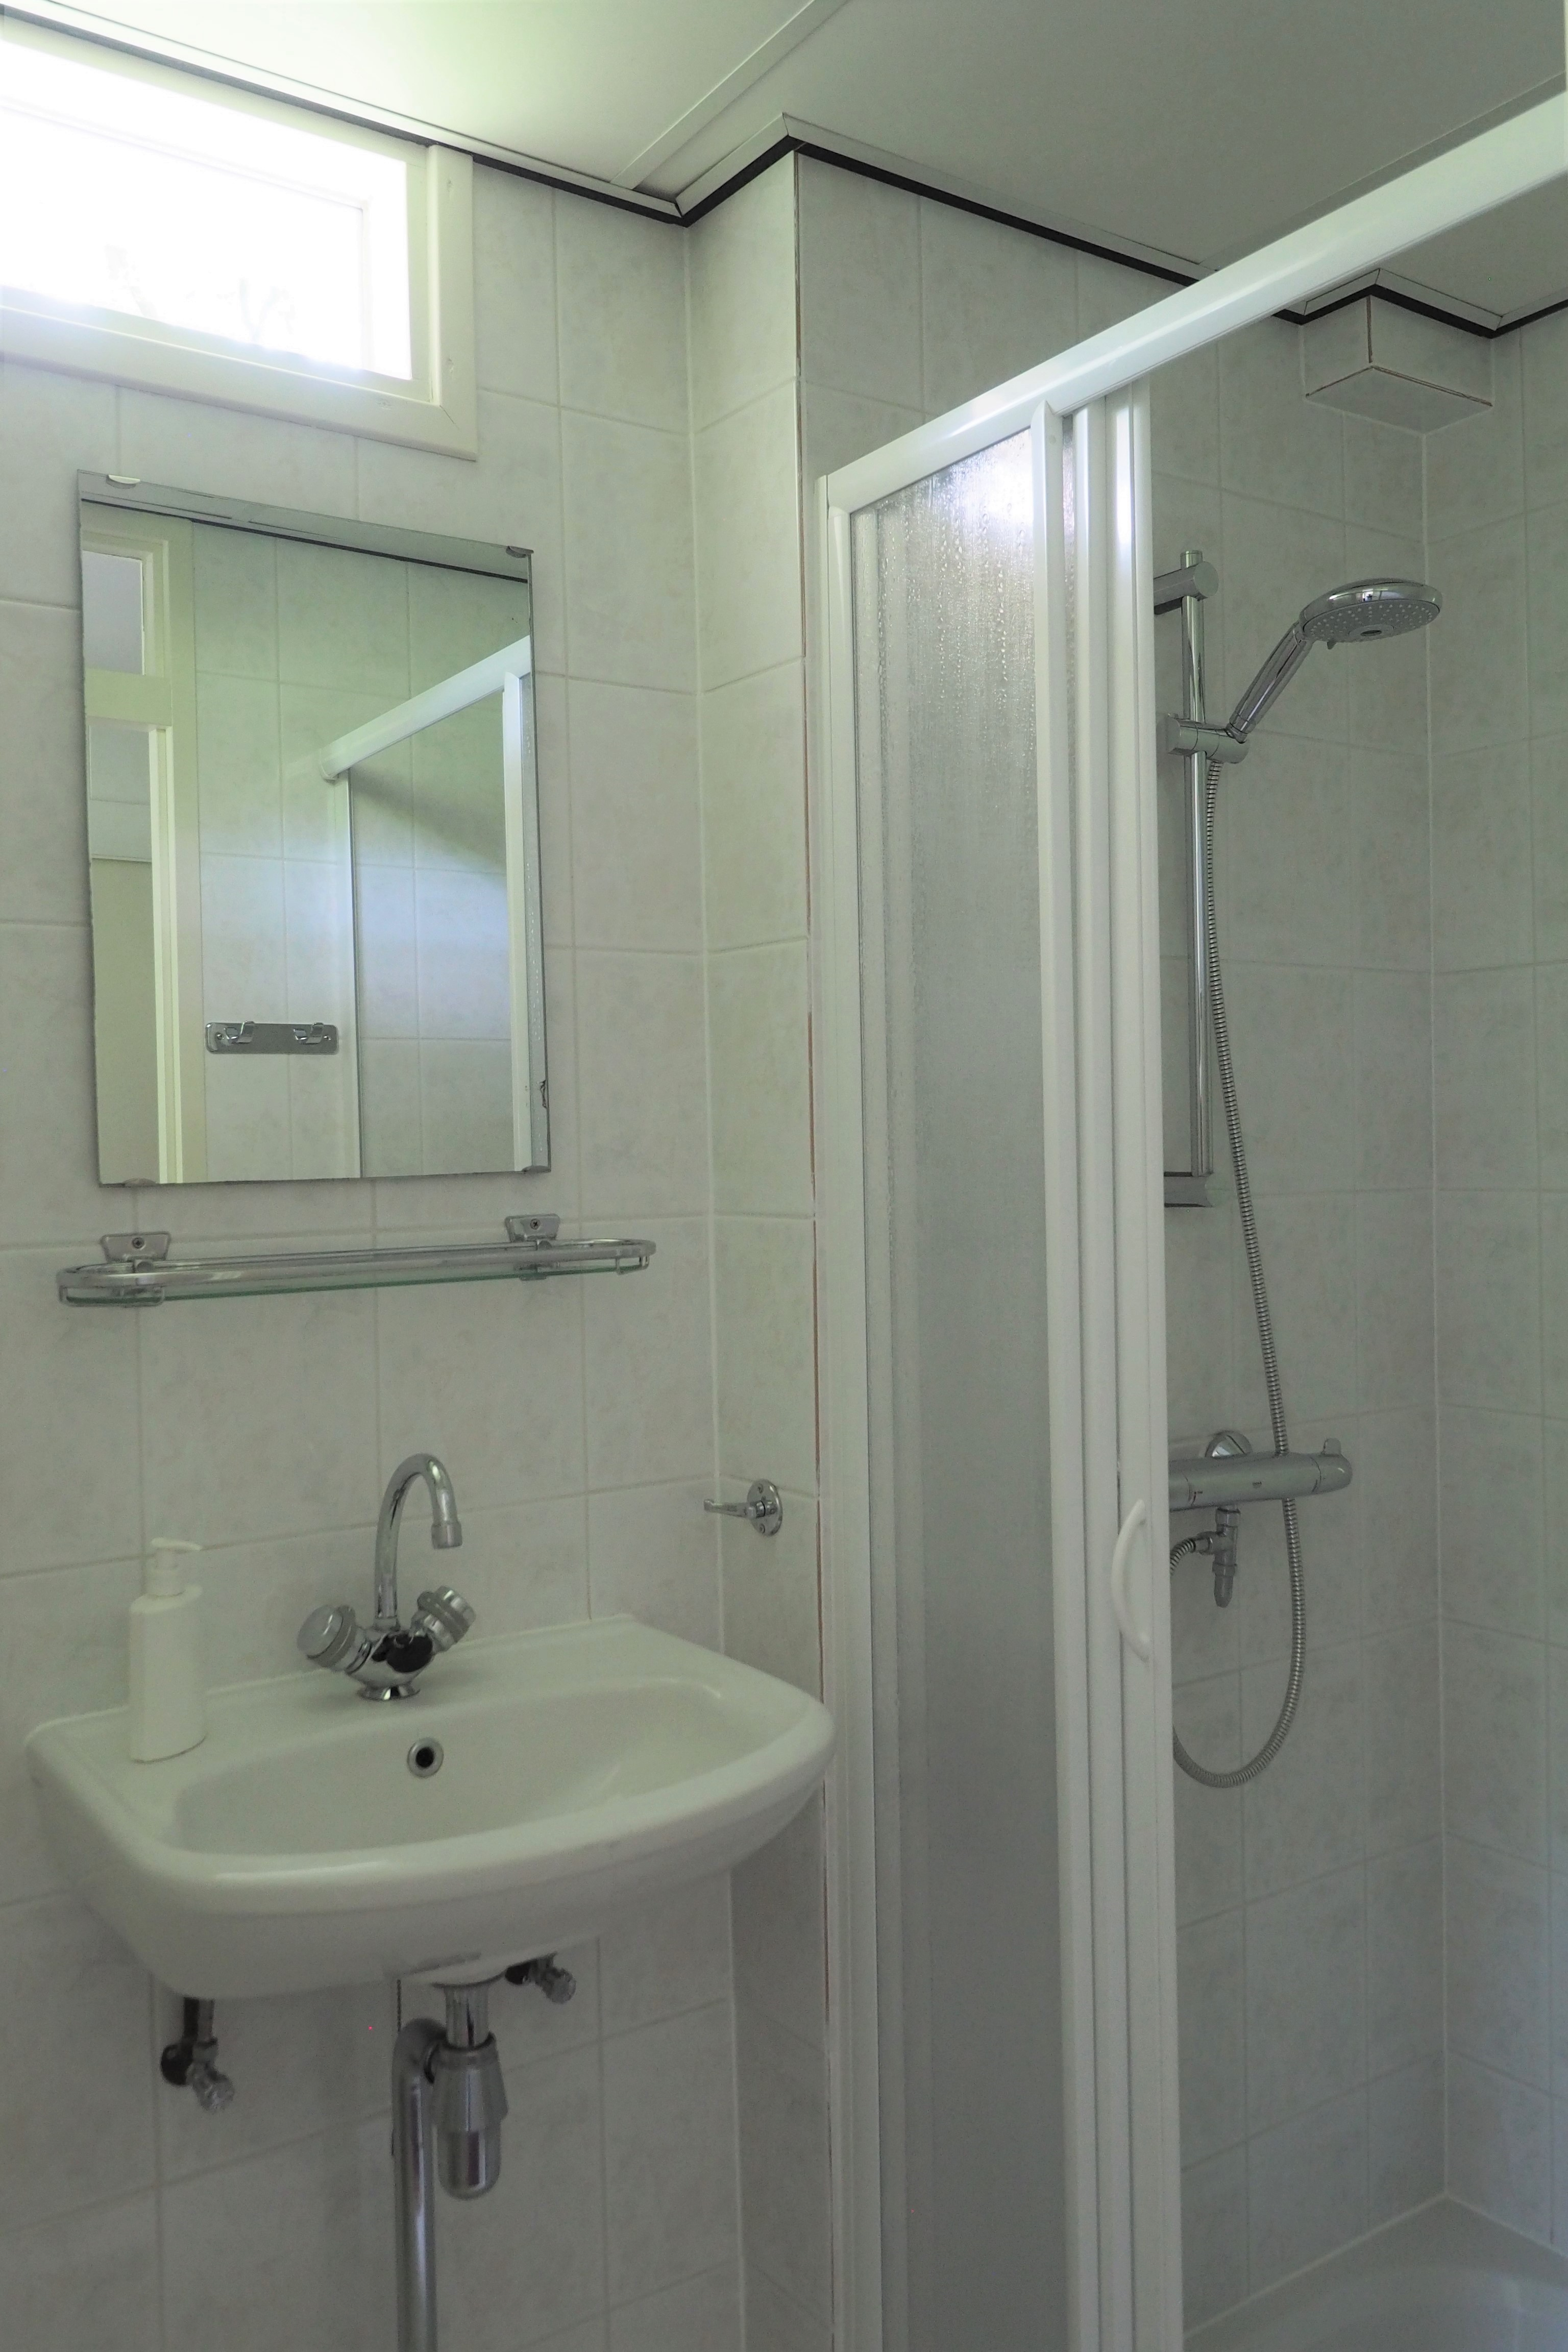 17-De badkamer